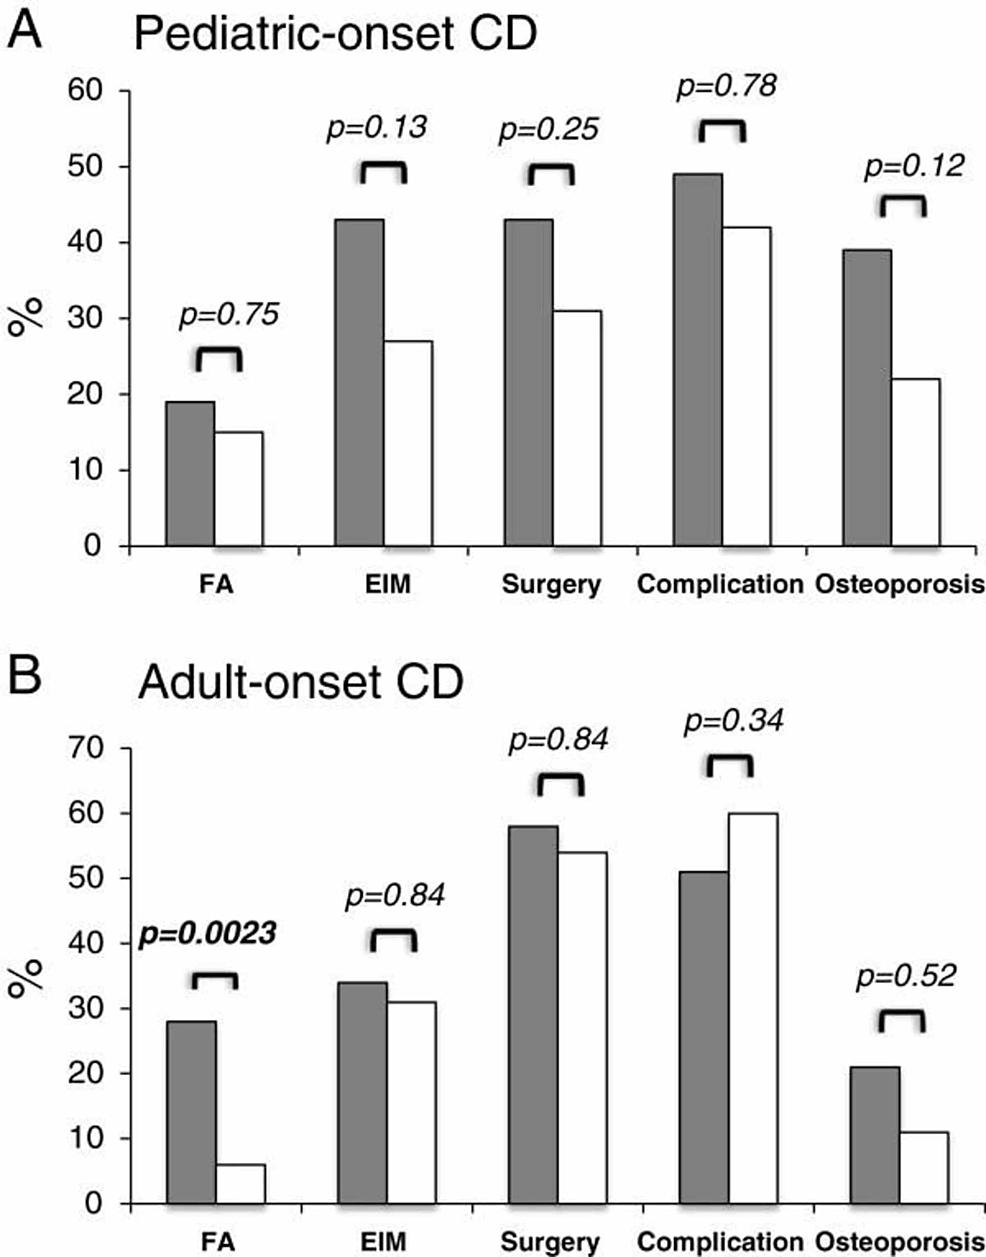 The-effect-of-NOD2-gene-variants-in-Crohn's-disease-(CD)-patients-(pediatric-and-adult)-on-disease-behavior